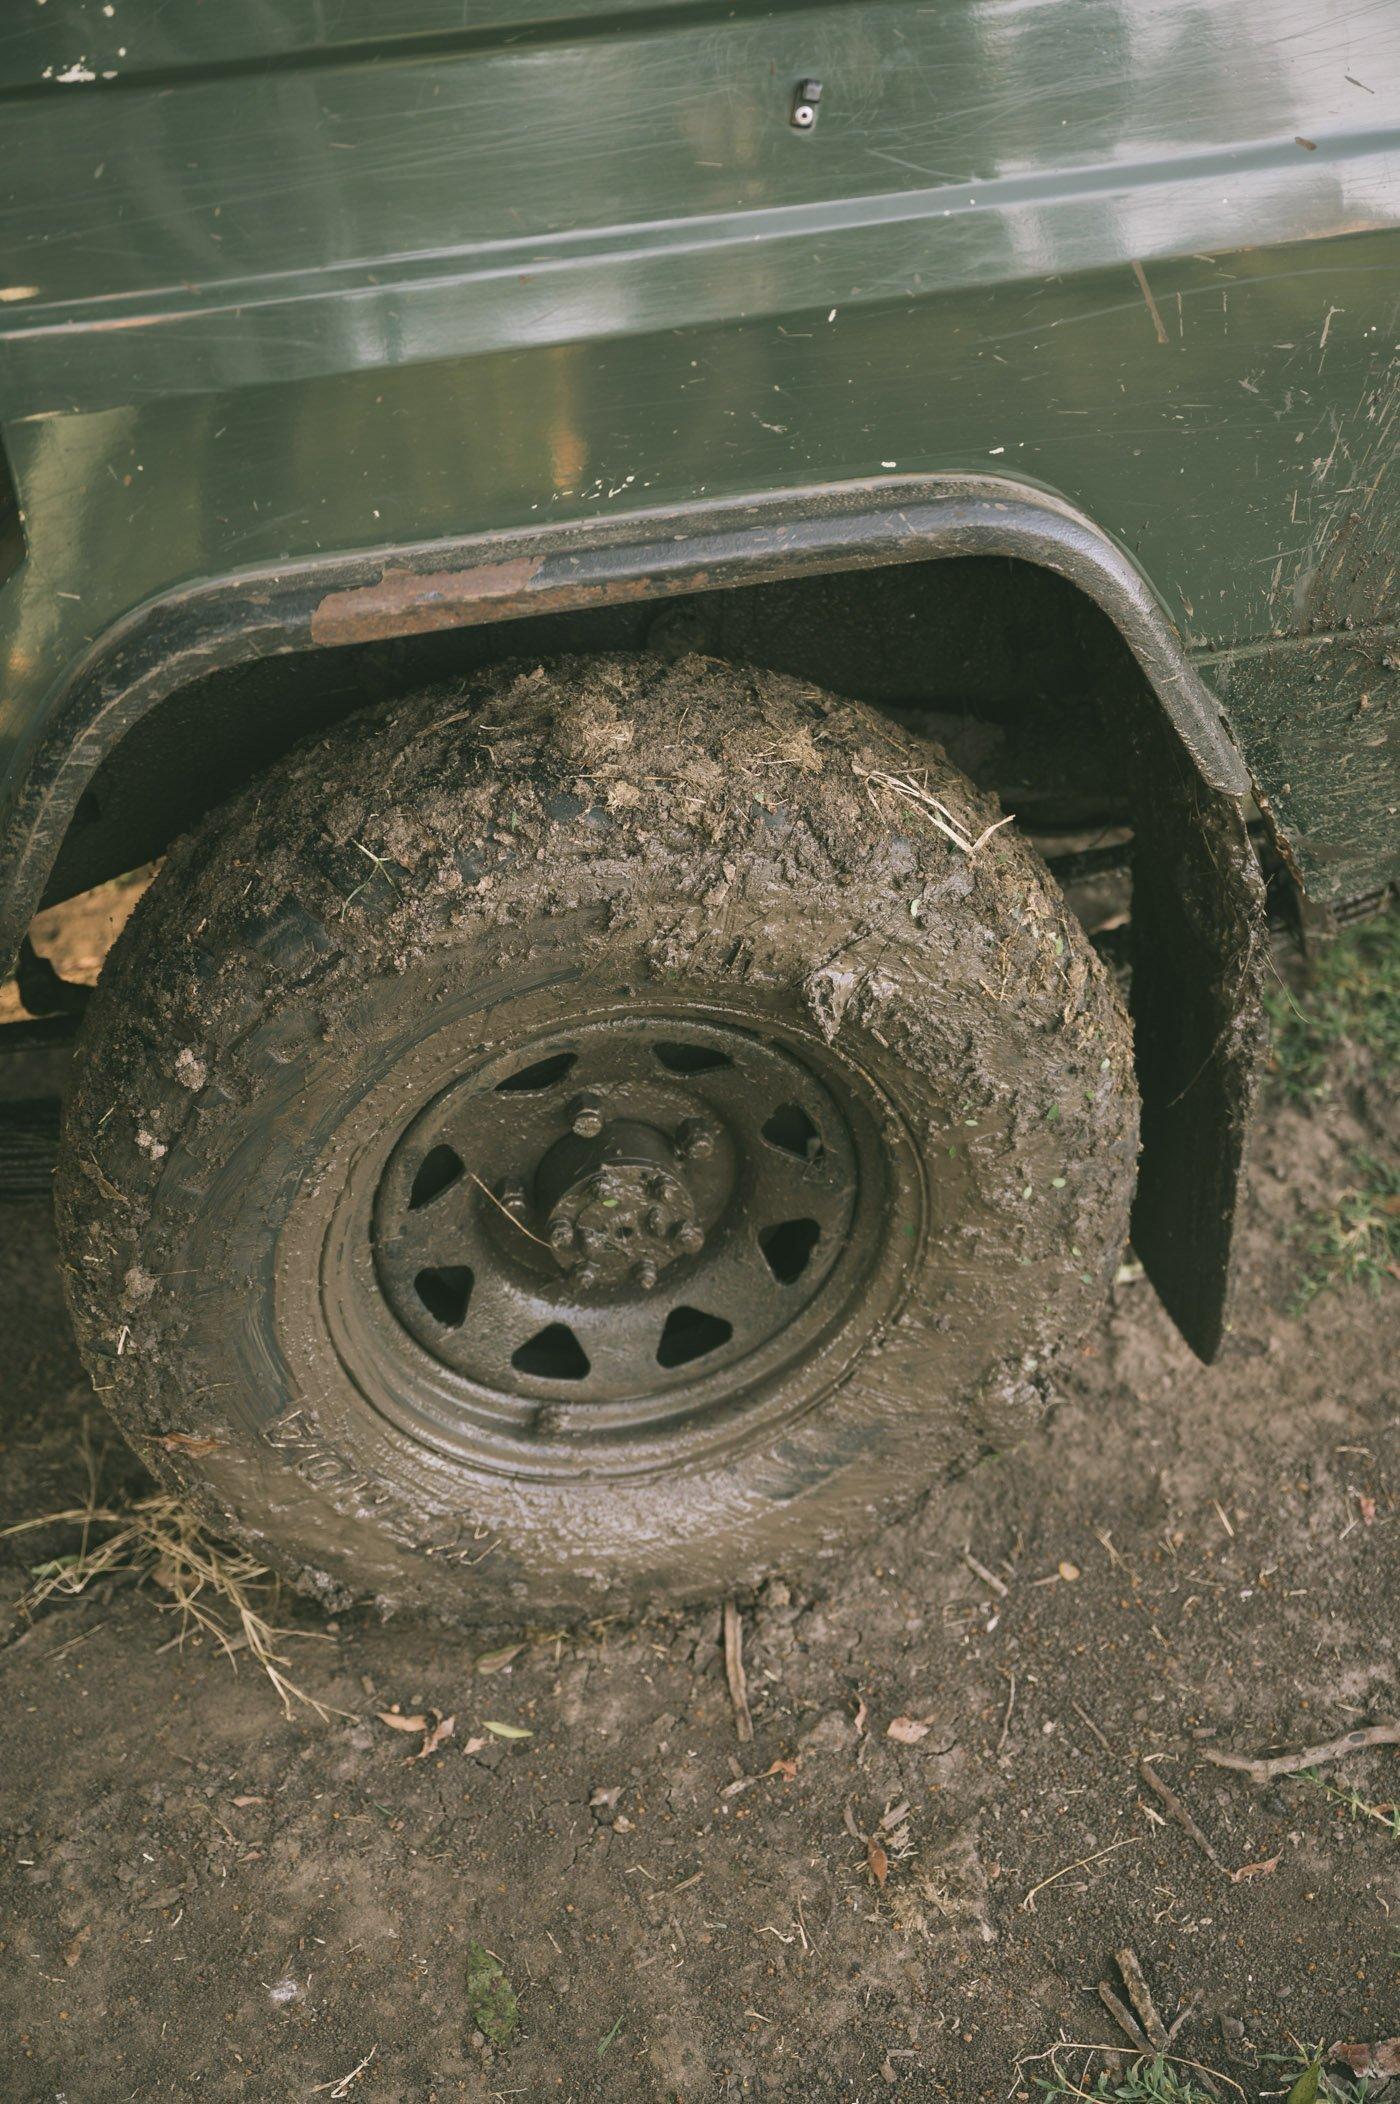 Muddy tyres after being stuck in the Maasai Mara in Kenya